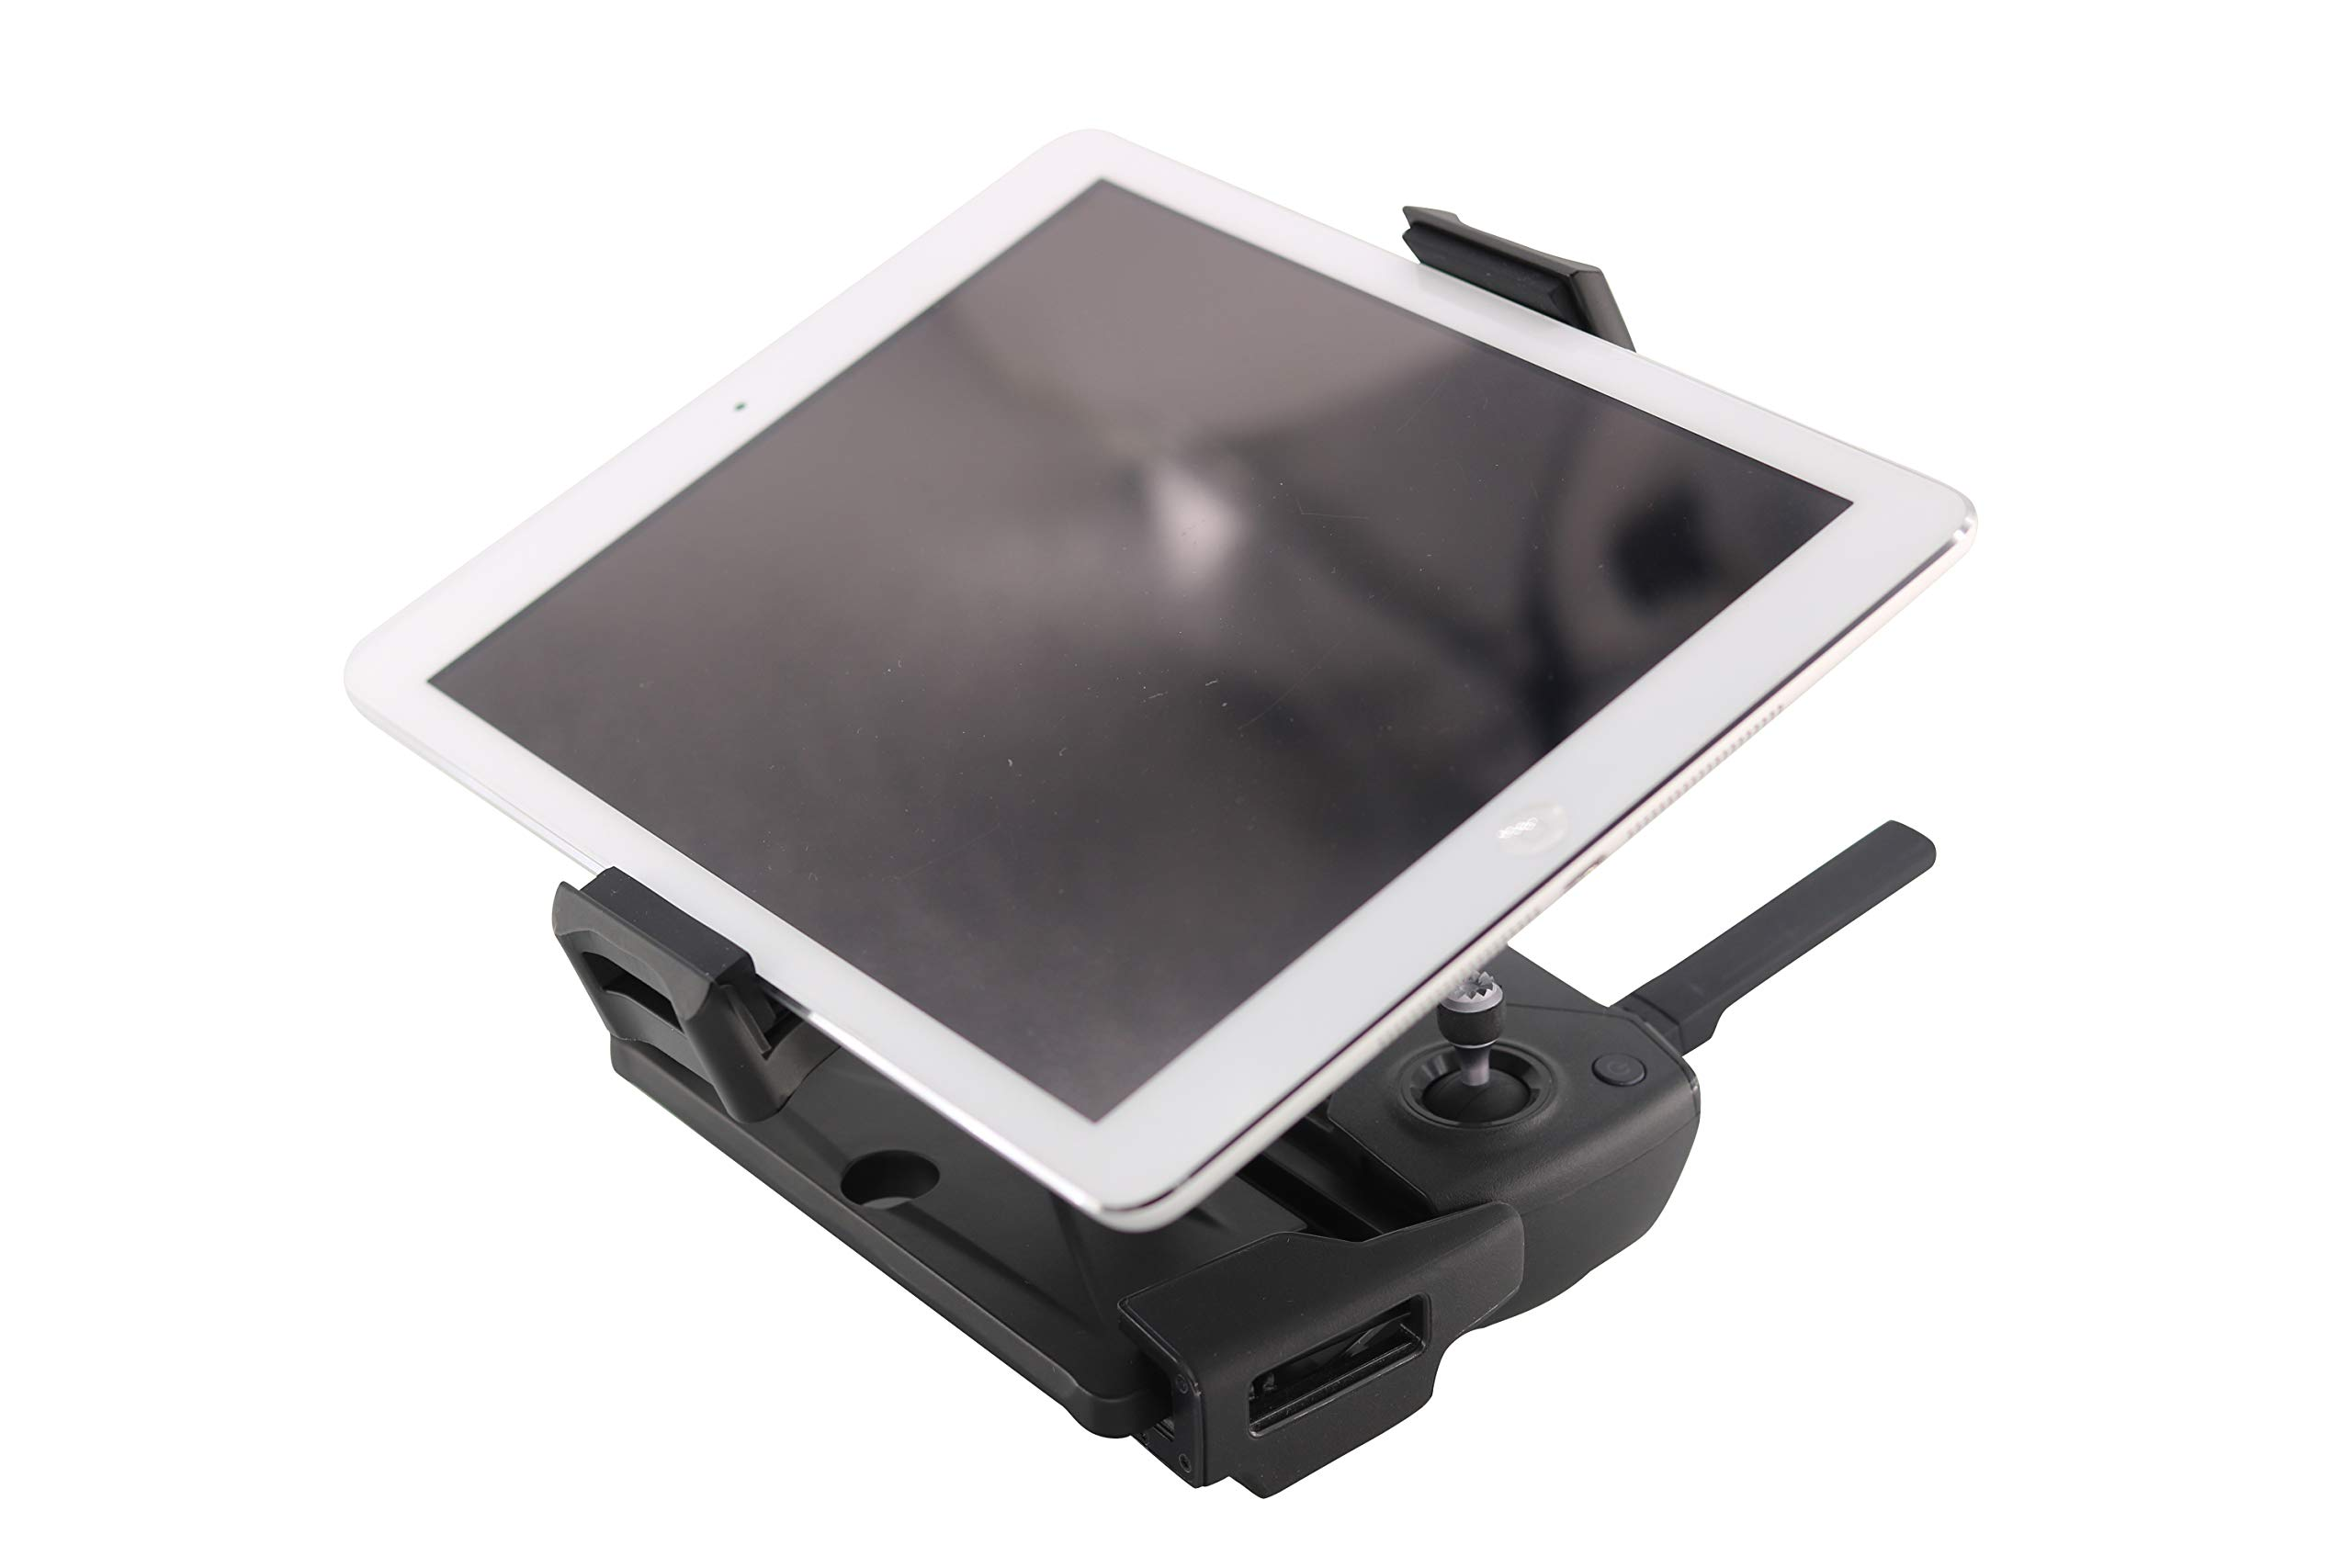 HeiyRC 12in Tablet Bracket for DJI Mavic Pro Spark Mavic air Tablet Holder Mount for 4.7 5.5 7.9 9.7 12 inch Tablet and Phone